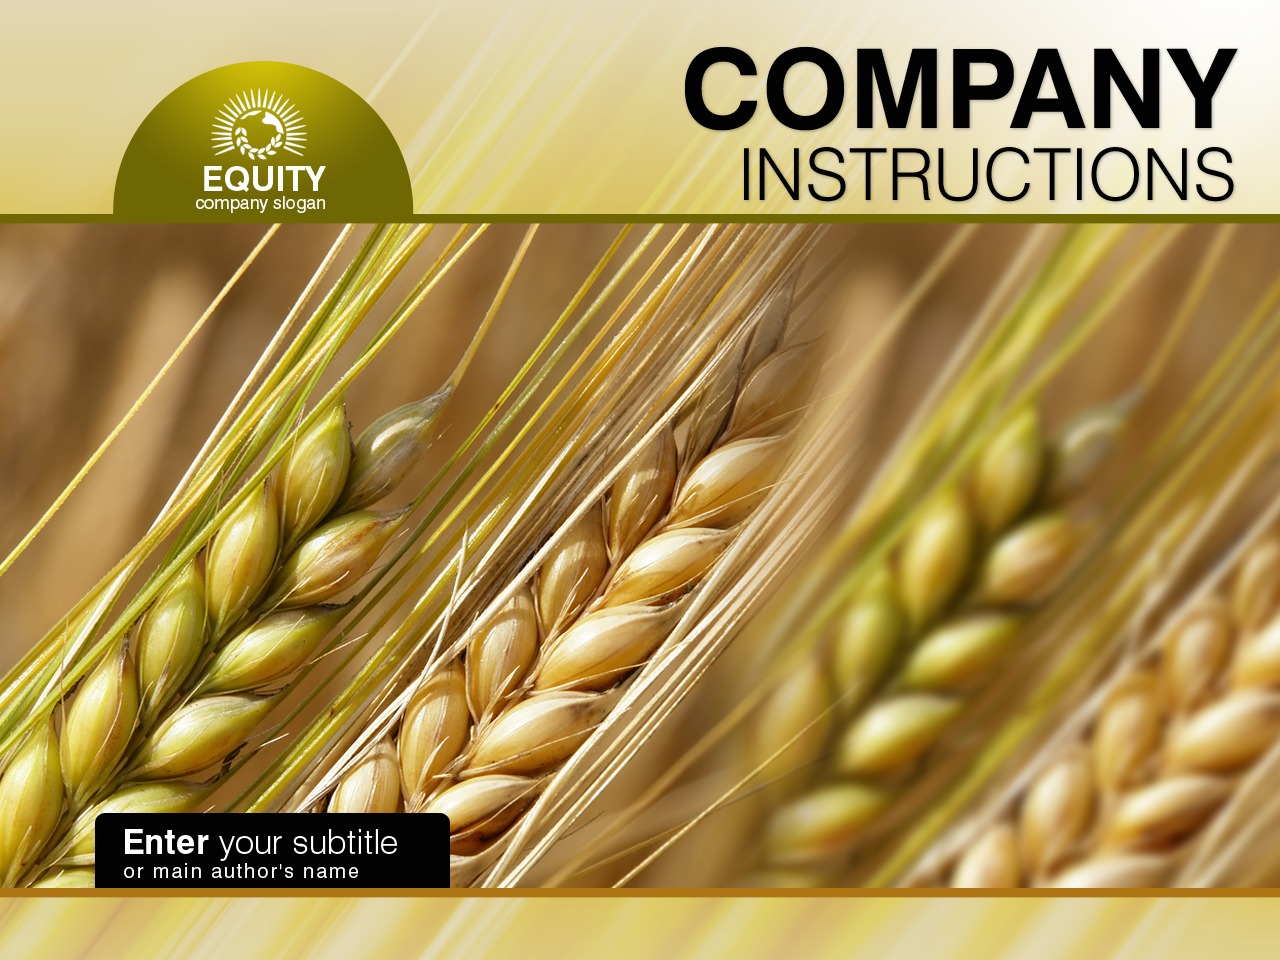 Szablon PowerPoint #34175 na temat: rolnictwo